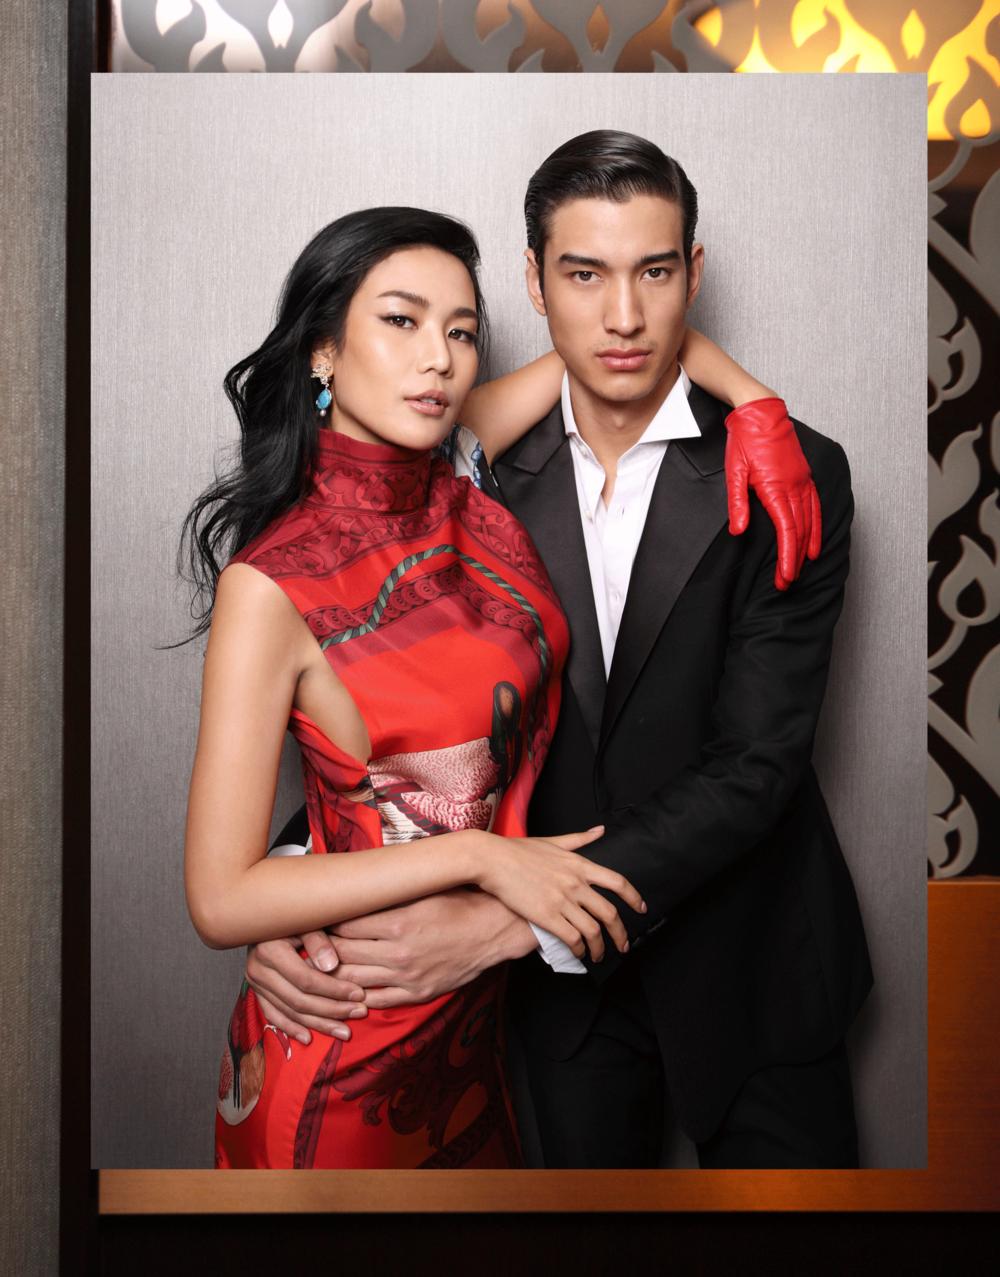 NING - dress & glove : Salvatore Ferragamo / earrings : 77th  MARK - clothes : VVONSUGUNNASIL